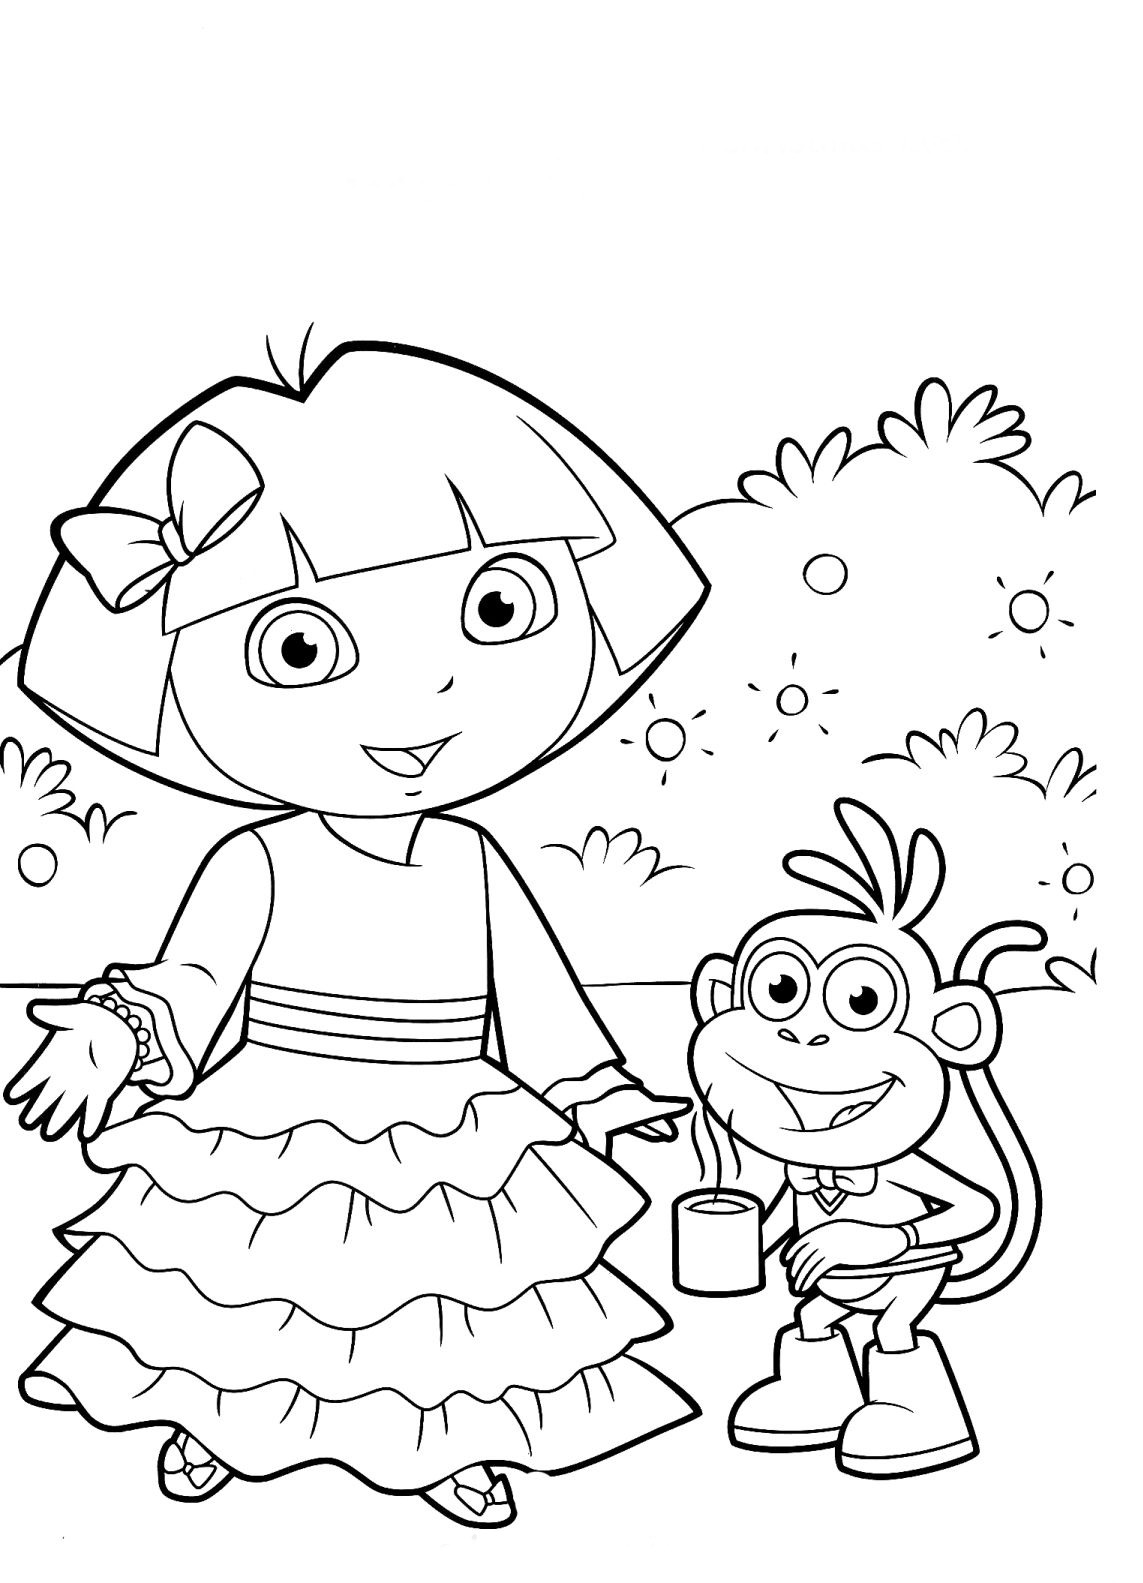 Dora Aventureira Para Colorir E Imprimir Muito Facil Colorir E